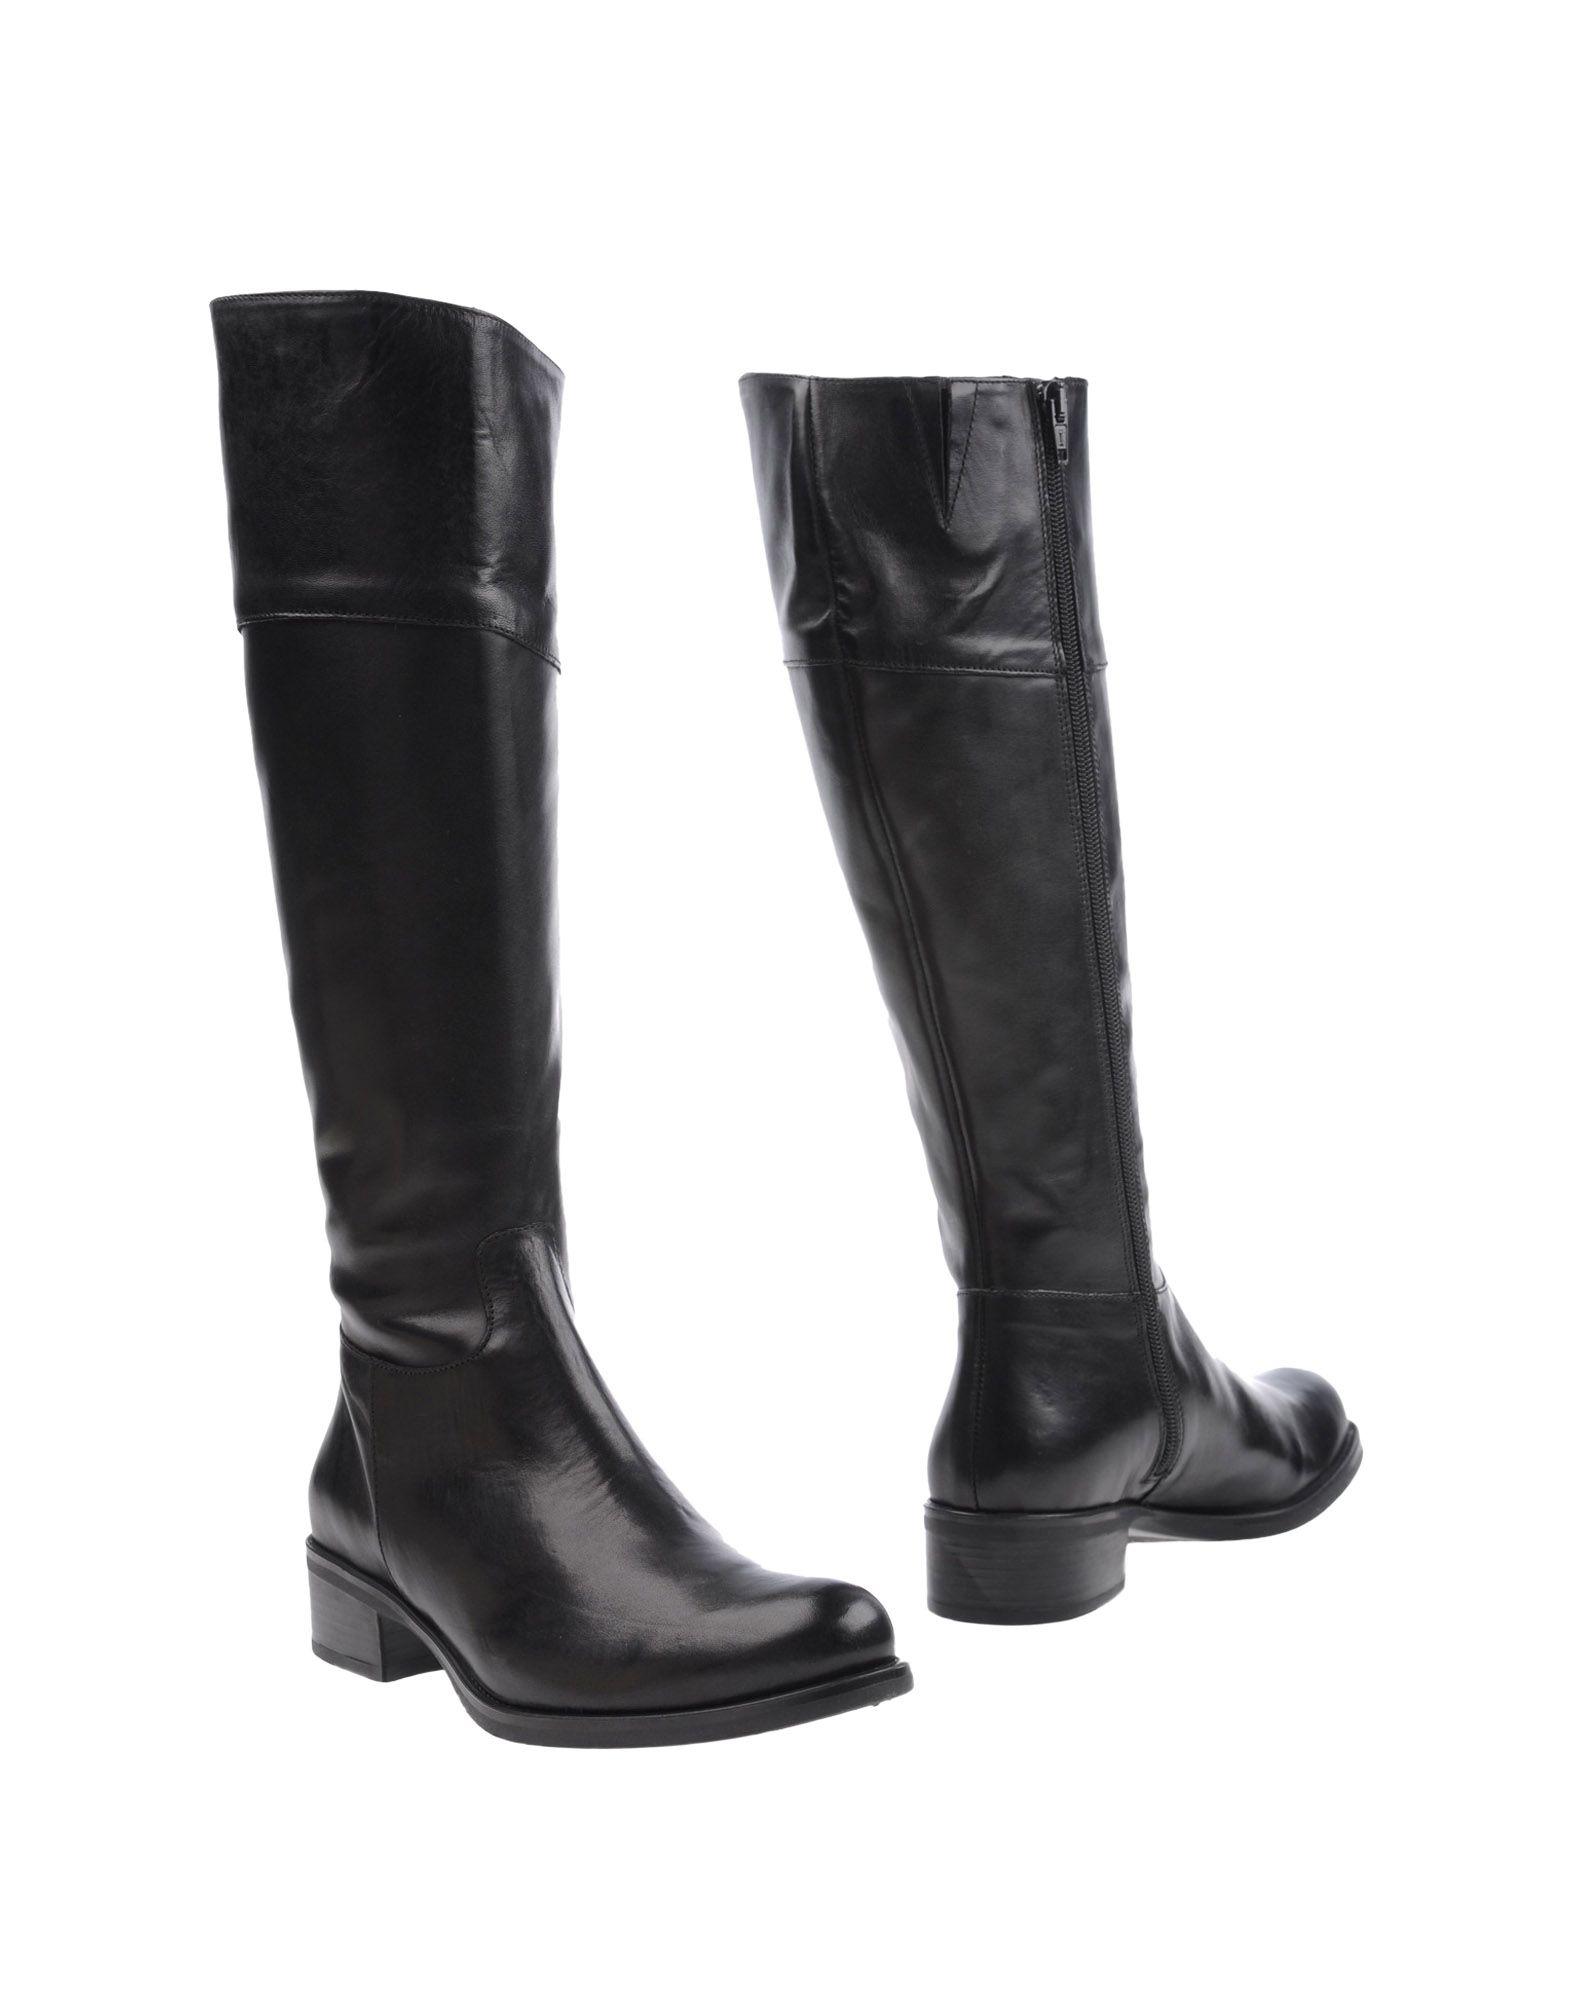 Paola Paola Paola Ferri Stiefel Damen  11226748UX Gute Qualität beliebte Schuhe 940588